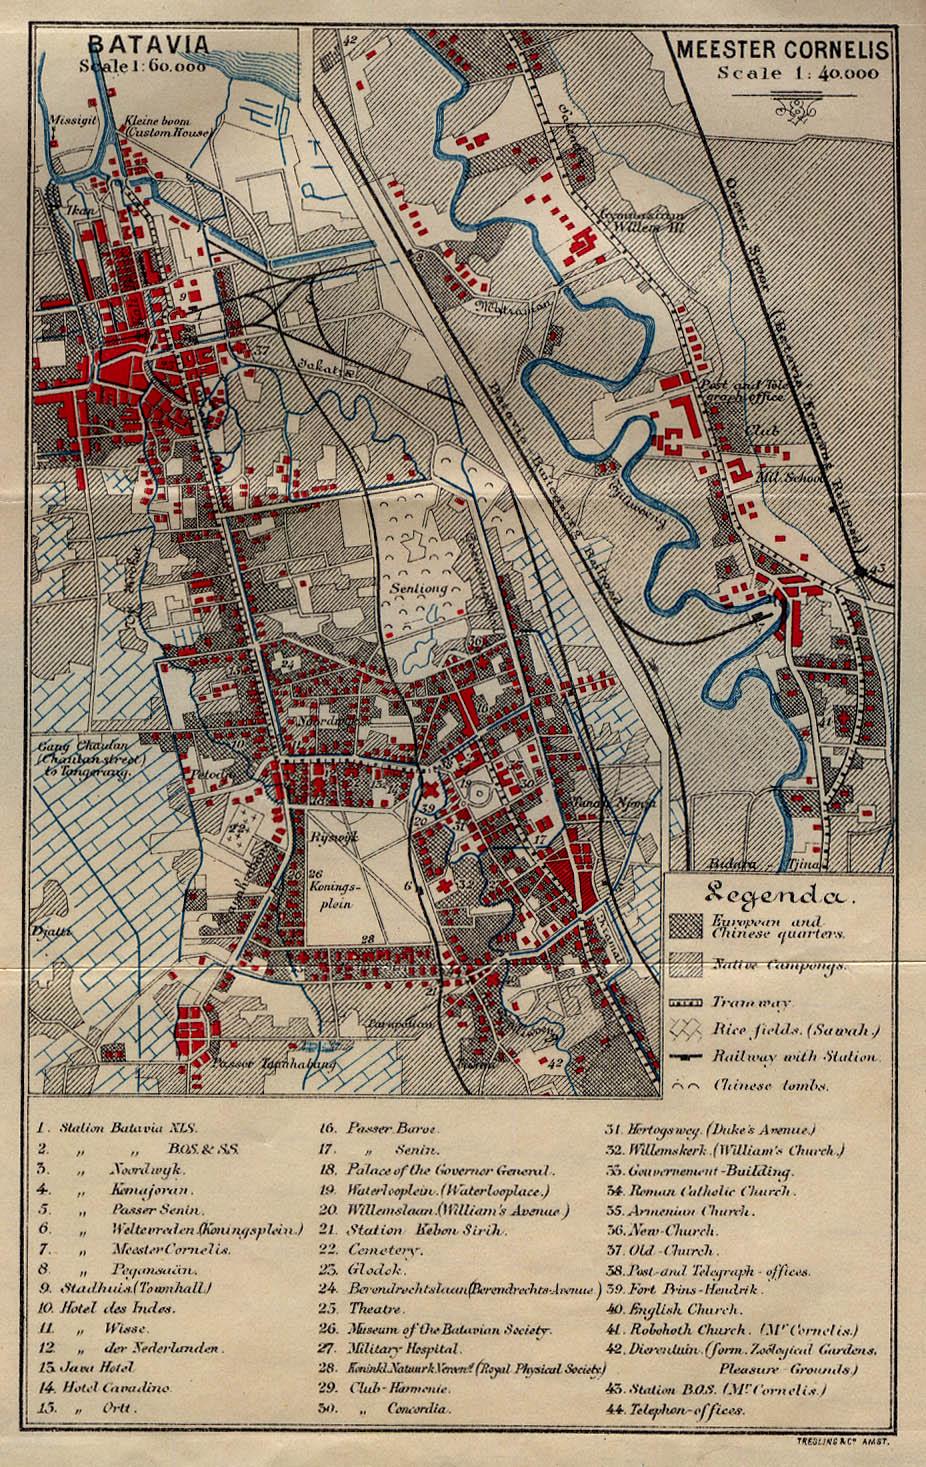 Batavia, 1897